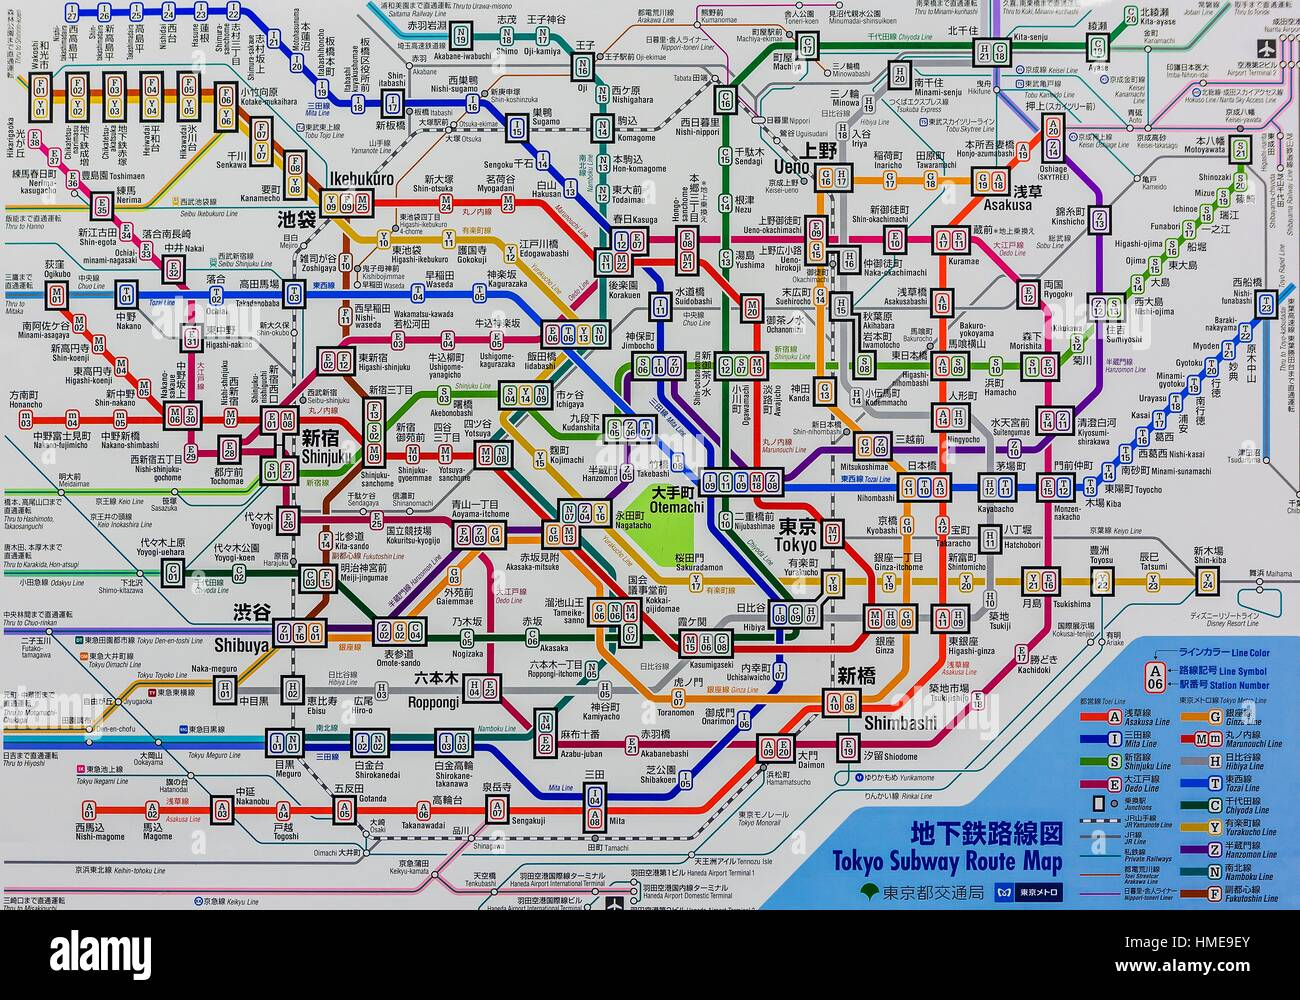 Japan Tokyo Tokyo Underground Station Map Stock Photo Royalty - Japan underground map